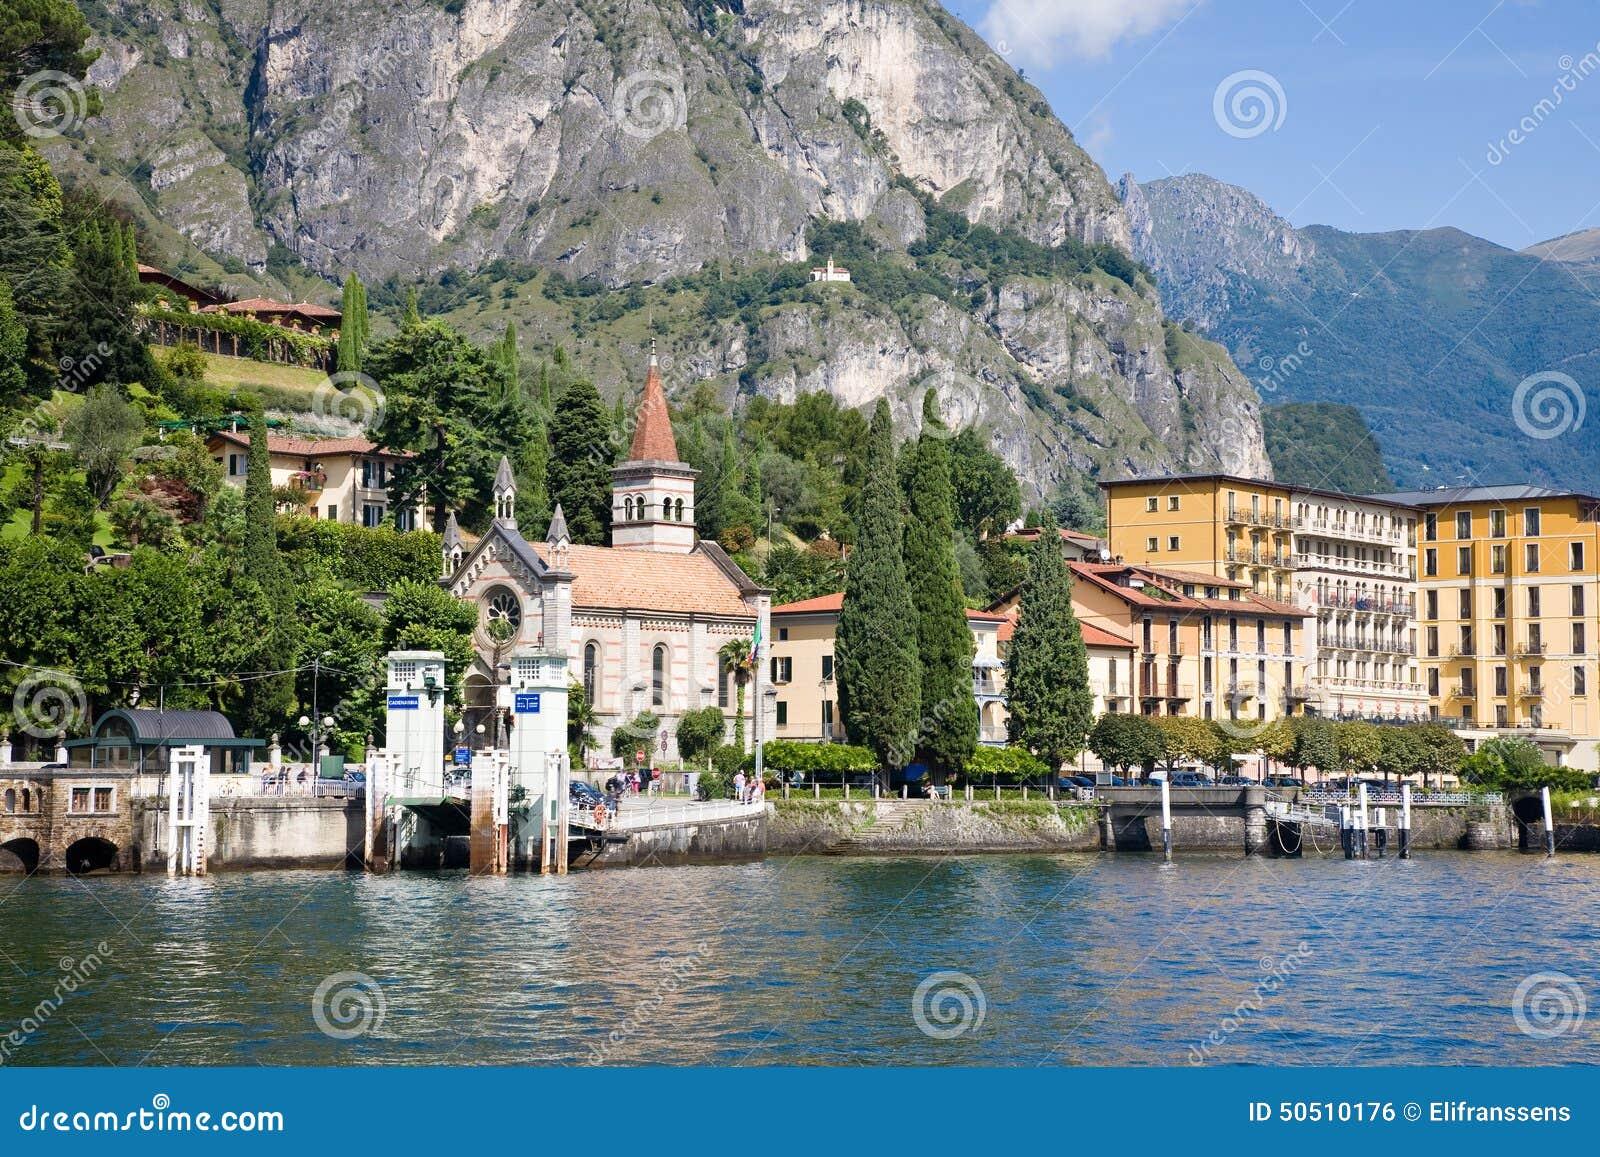 Villa Carlotta Cadenabbia Lake Como